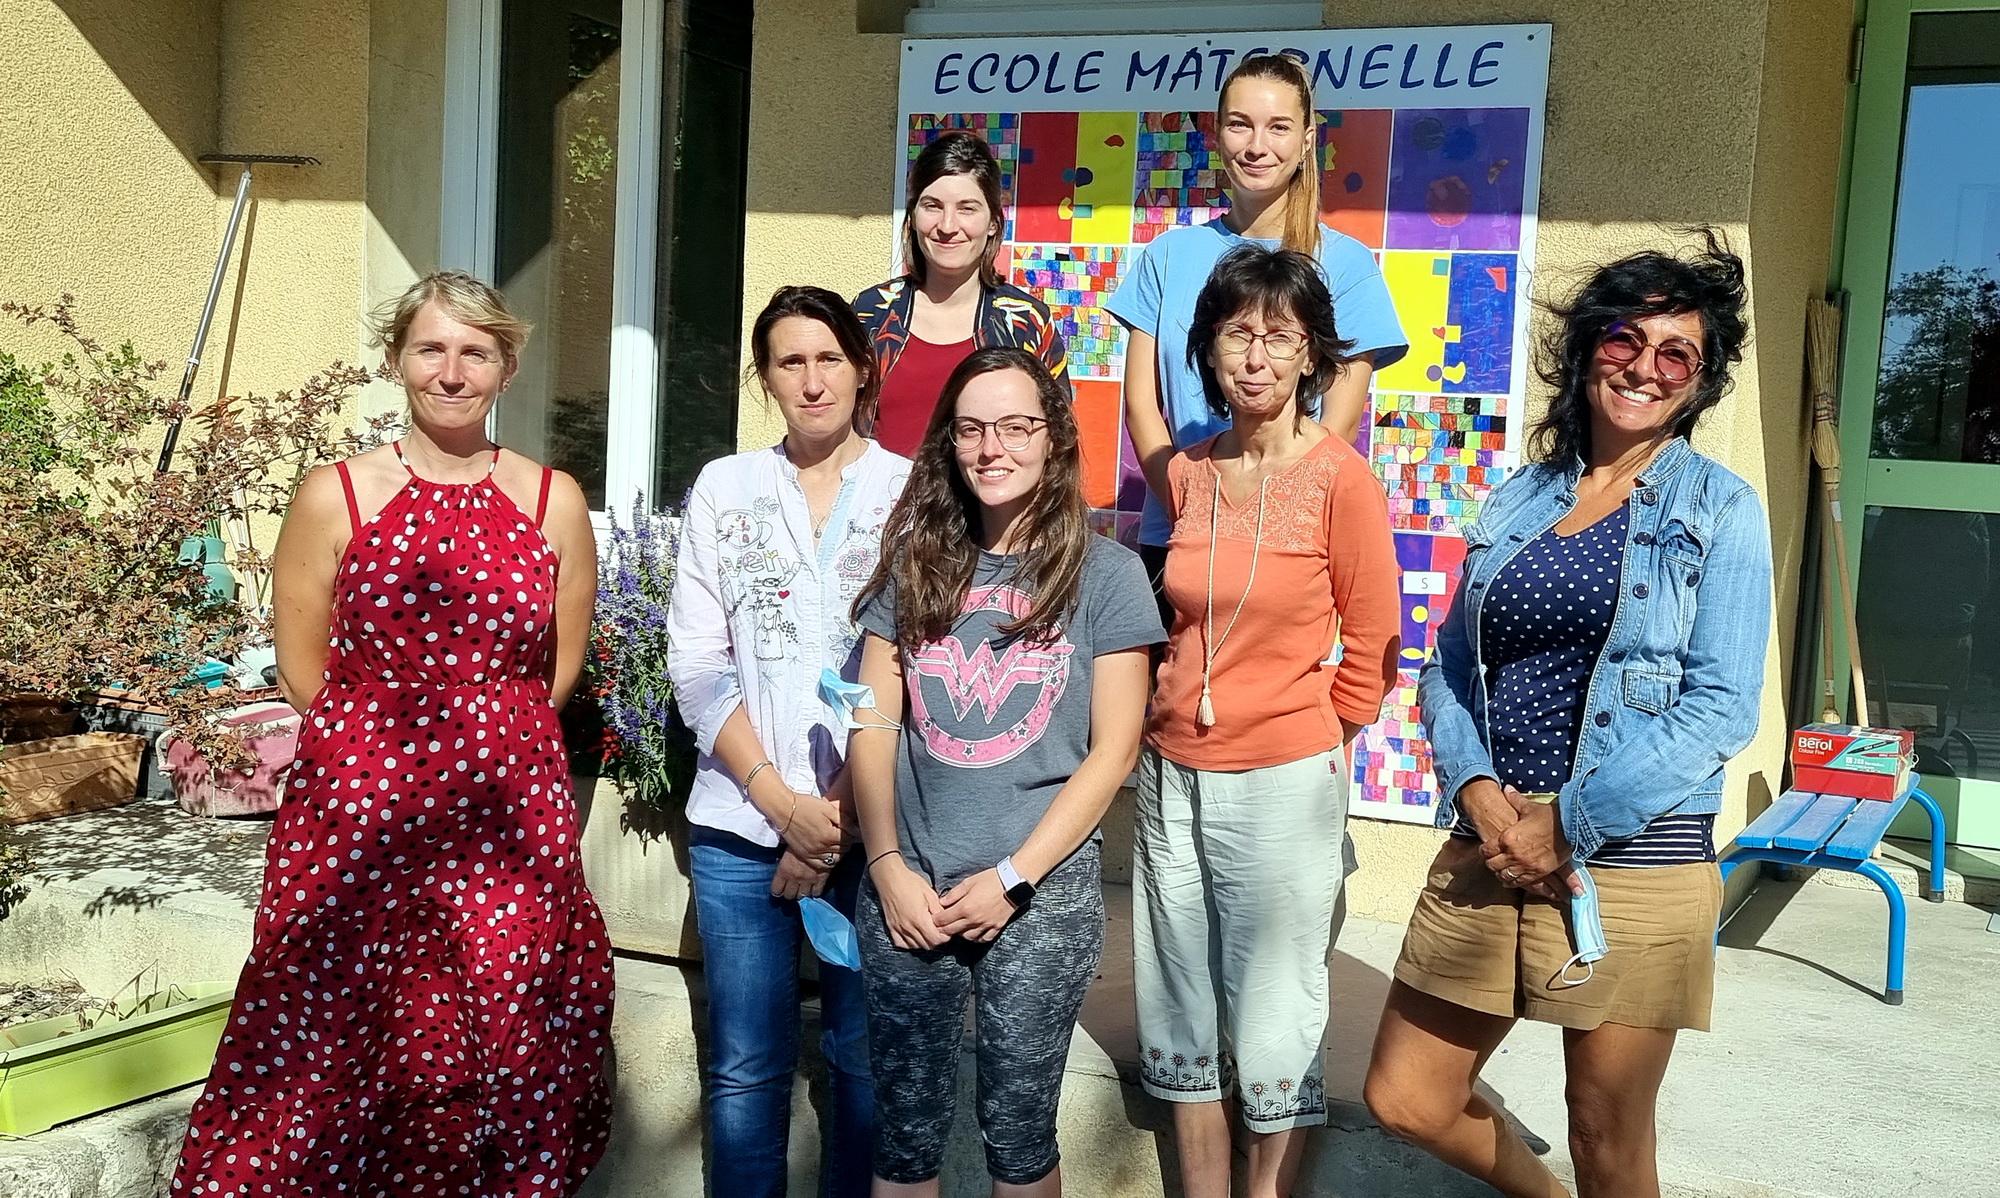 LGA - Ecoles primaire - sept 2021 - rentree scolaire  _2_.jpg